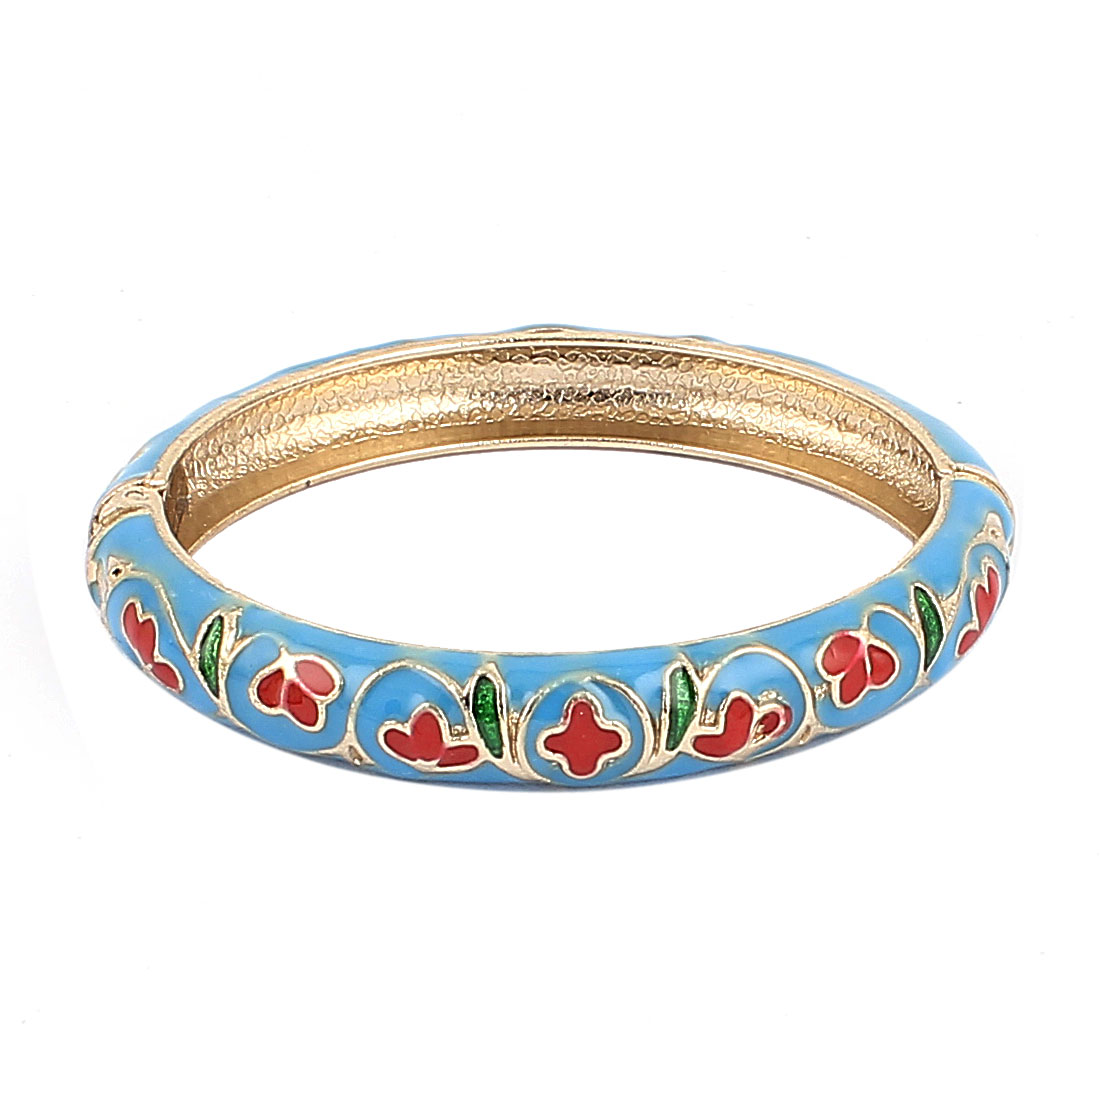 Woman Lady Spring Hinged Flower Pattern Enamel Cuff Bracelet Bangle Wristband Blue